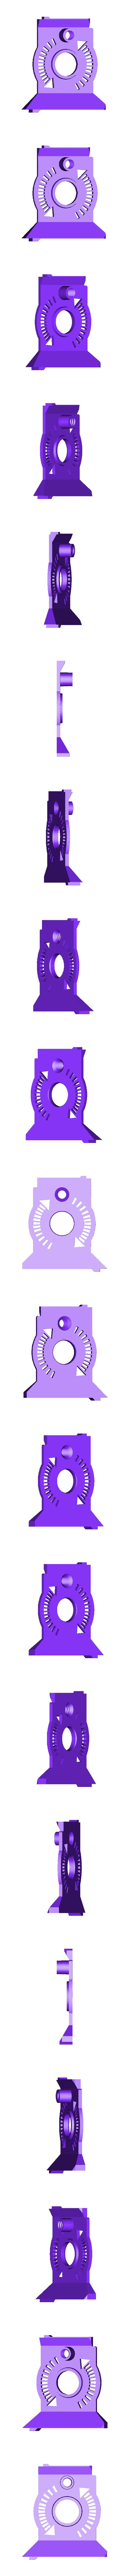 Wall_1.stl Download STL file Shape Shaker_Caterpillar • Design to 3D print, Ocrobus